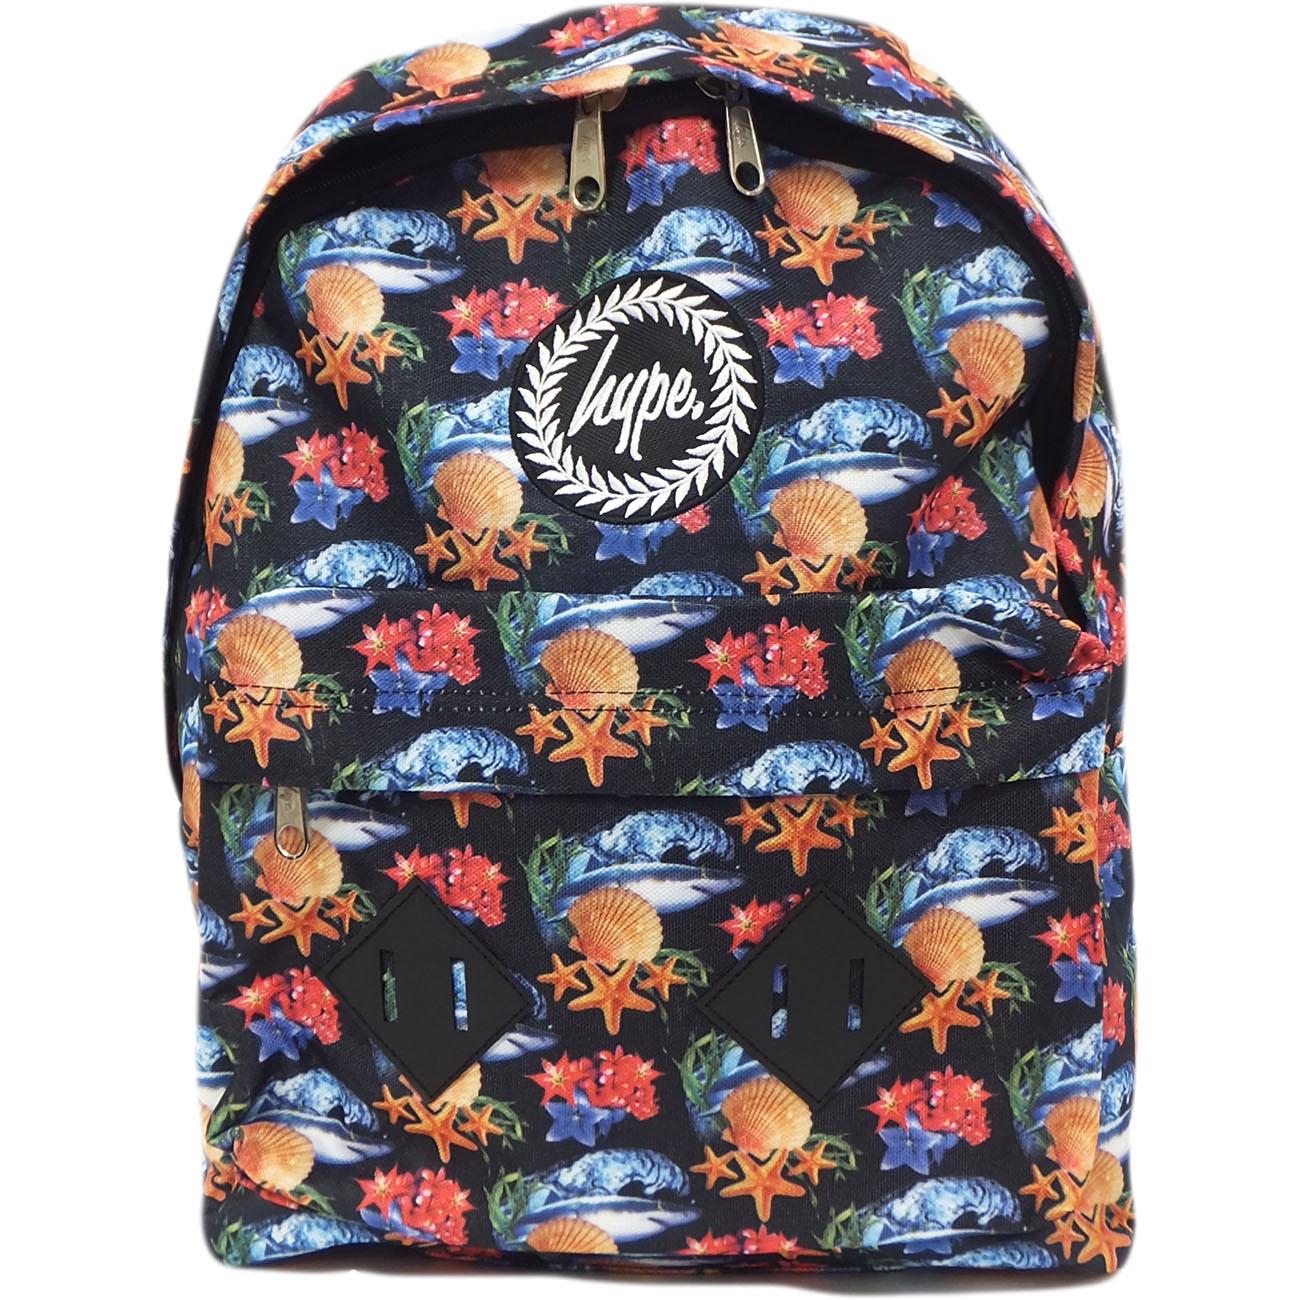 Hype Backpack Bag 'Shells'